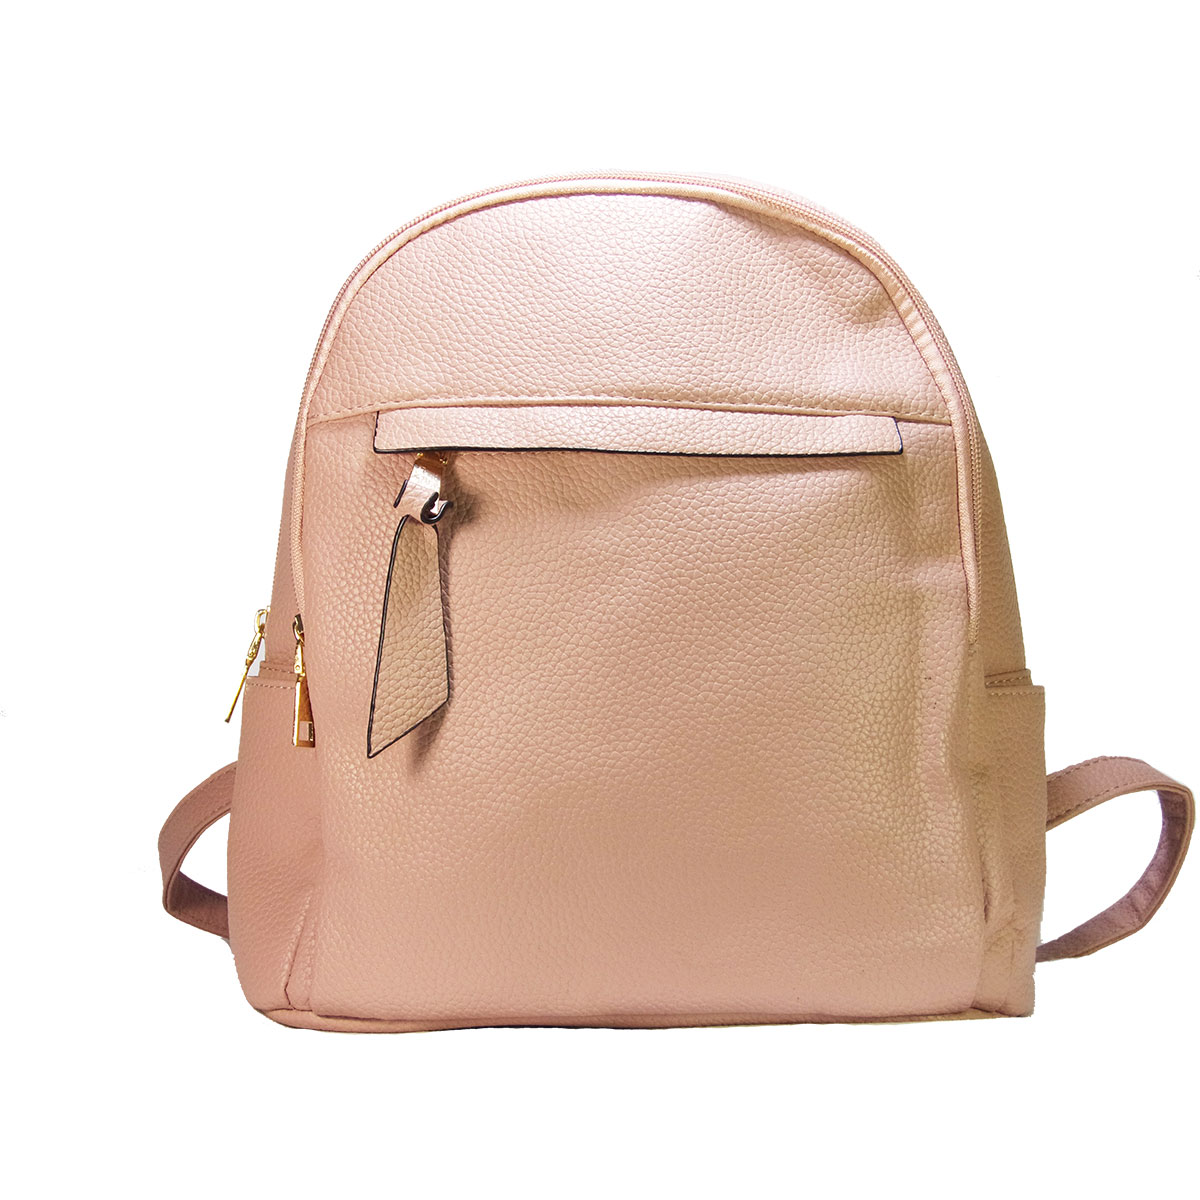 eae1a01b6cb LoveBags 970 Γυναικεία Τσάντα Πλάτης-Backpack Ροζ – ILoveMyShoes